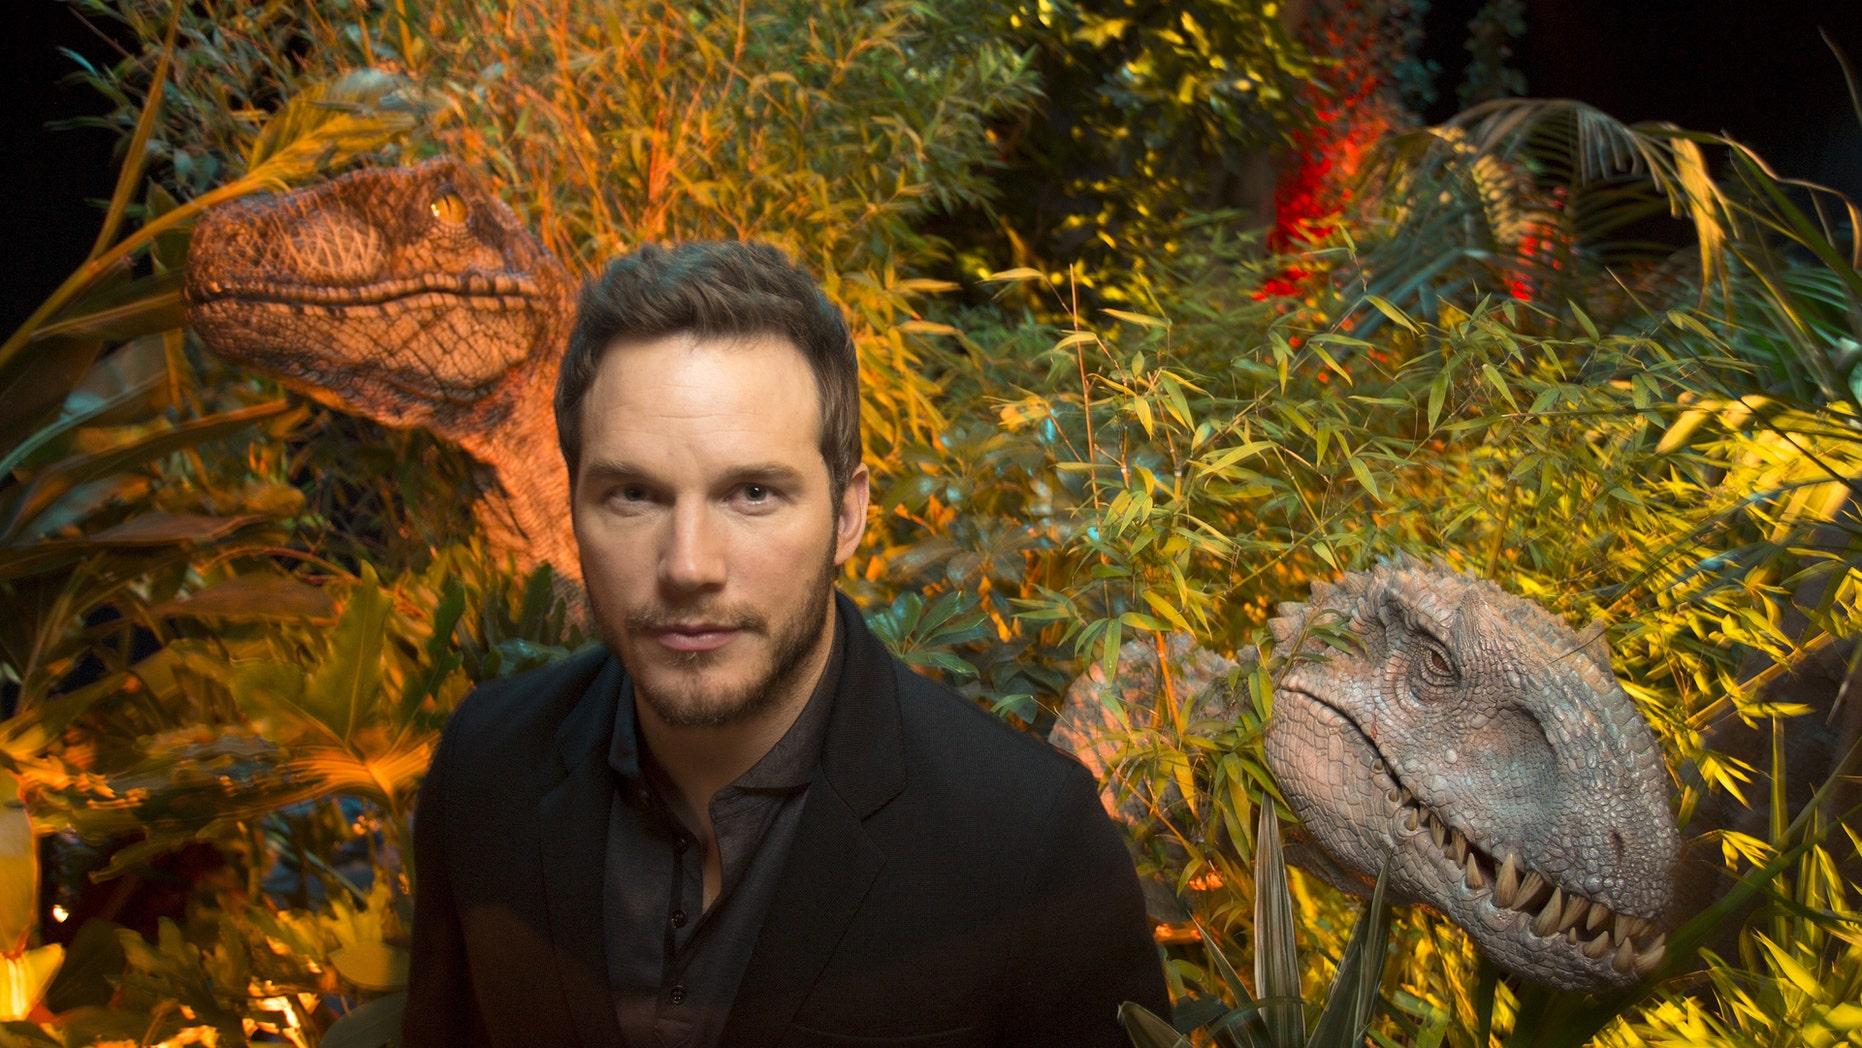 "File photo: Actor Chris Pratt, who plays raptor trainer Owen in ""Jurassic World"", poses at Universal Studios in Los Angeles, California, June 6, 2015. (REUTERS/David McNew)"